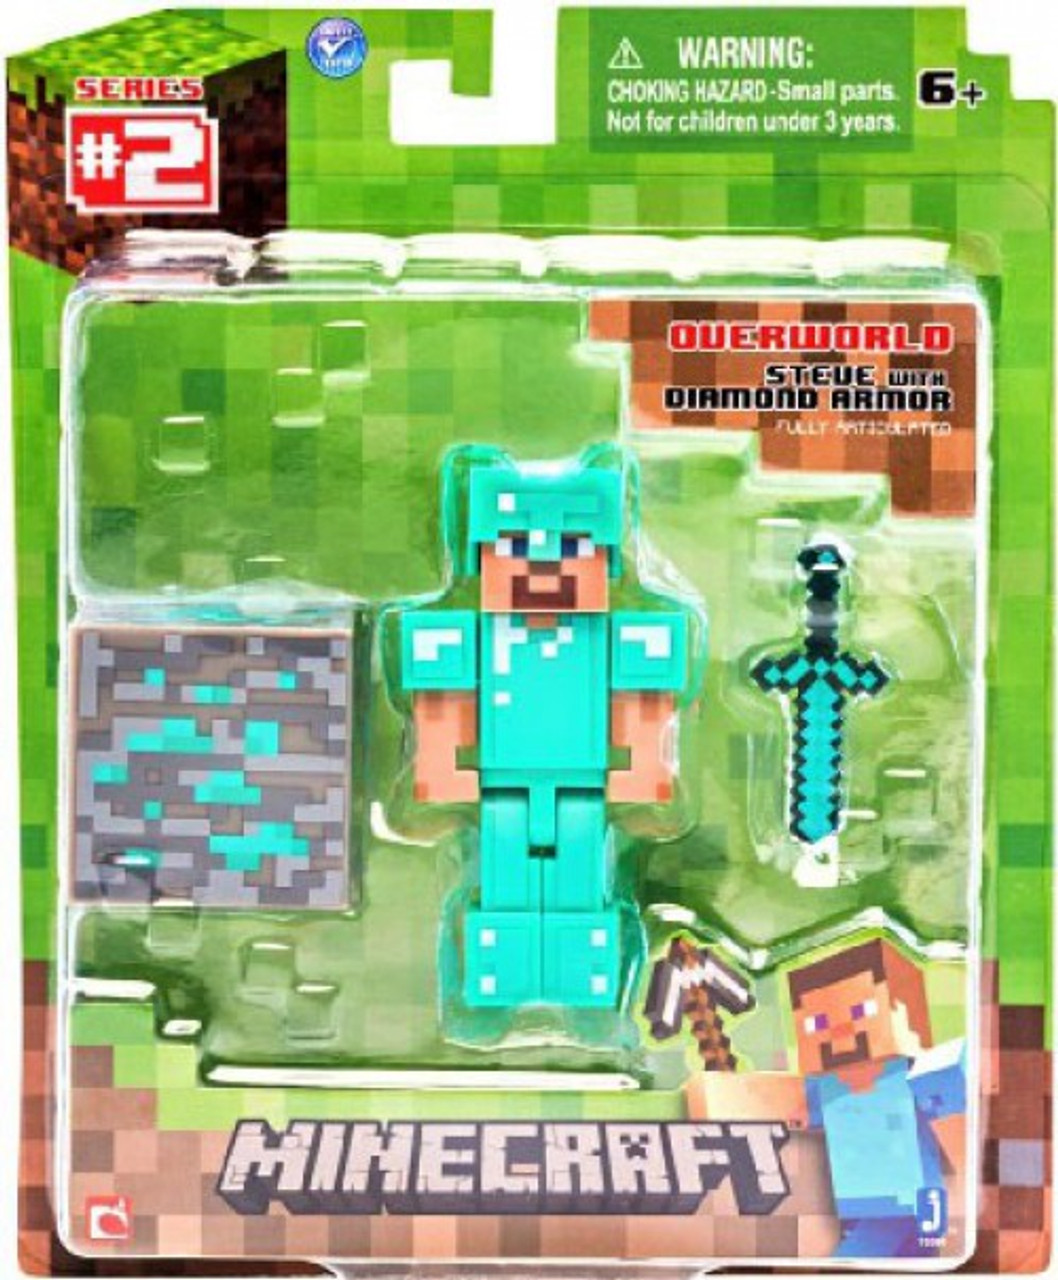 Minecraft Series 2 Steve with Diamond Armor Action Figure [Overworld]